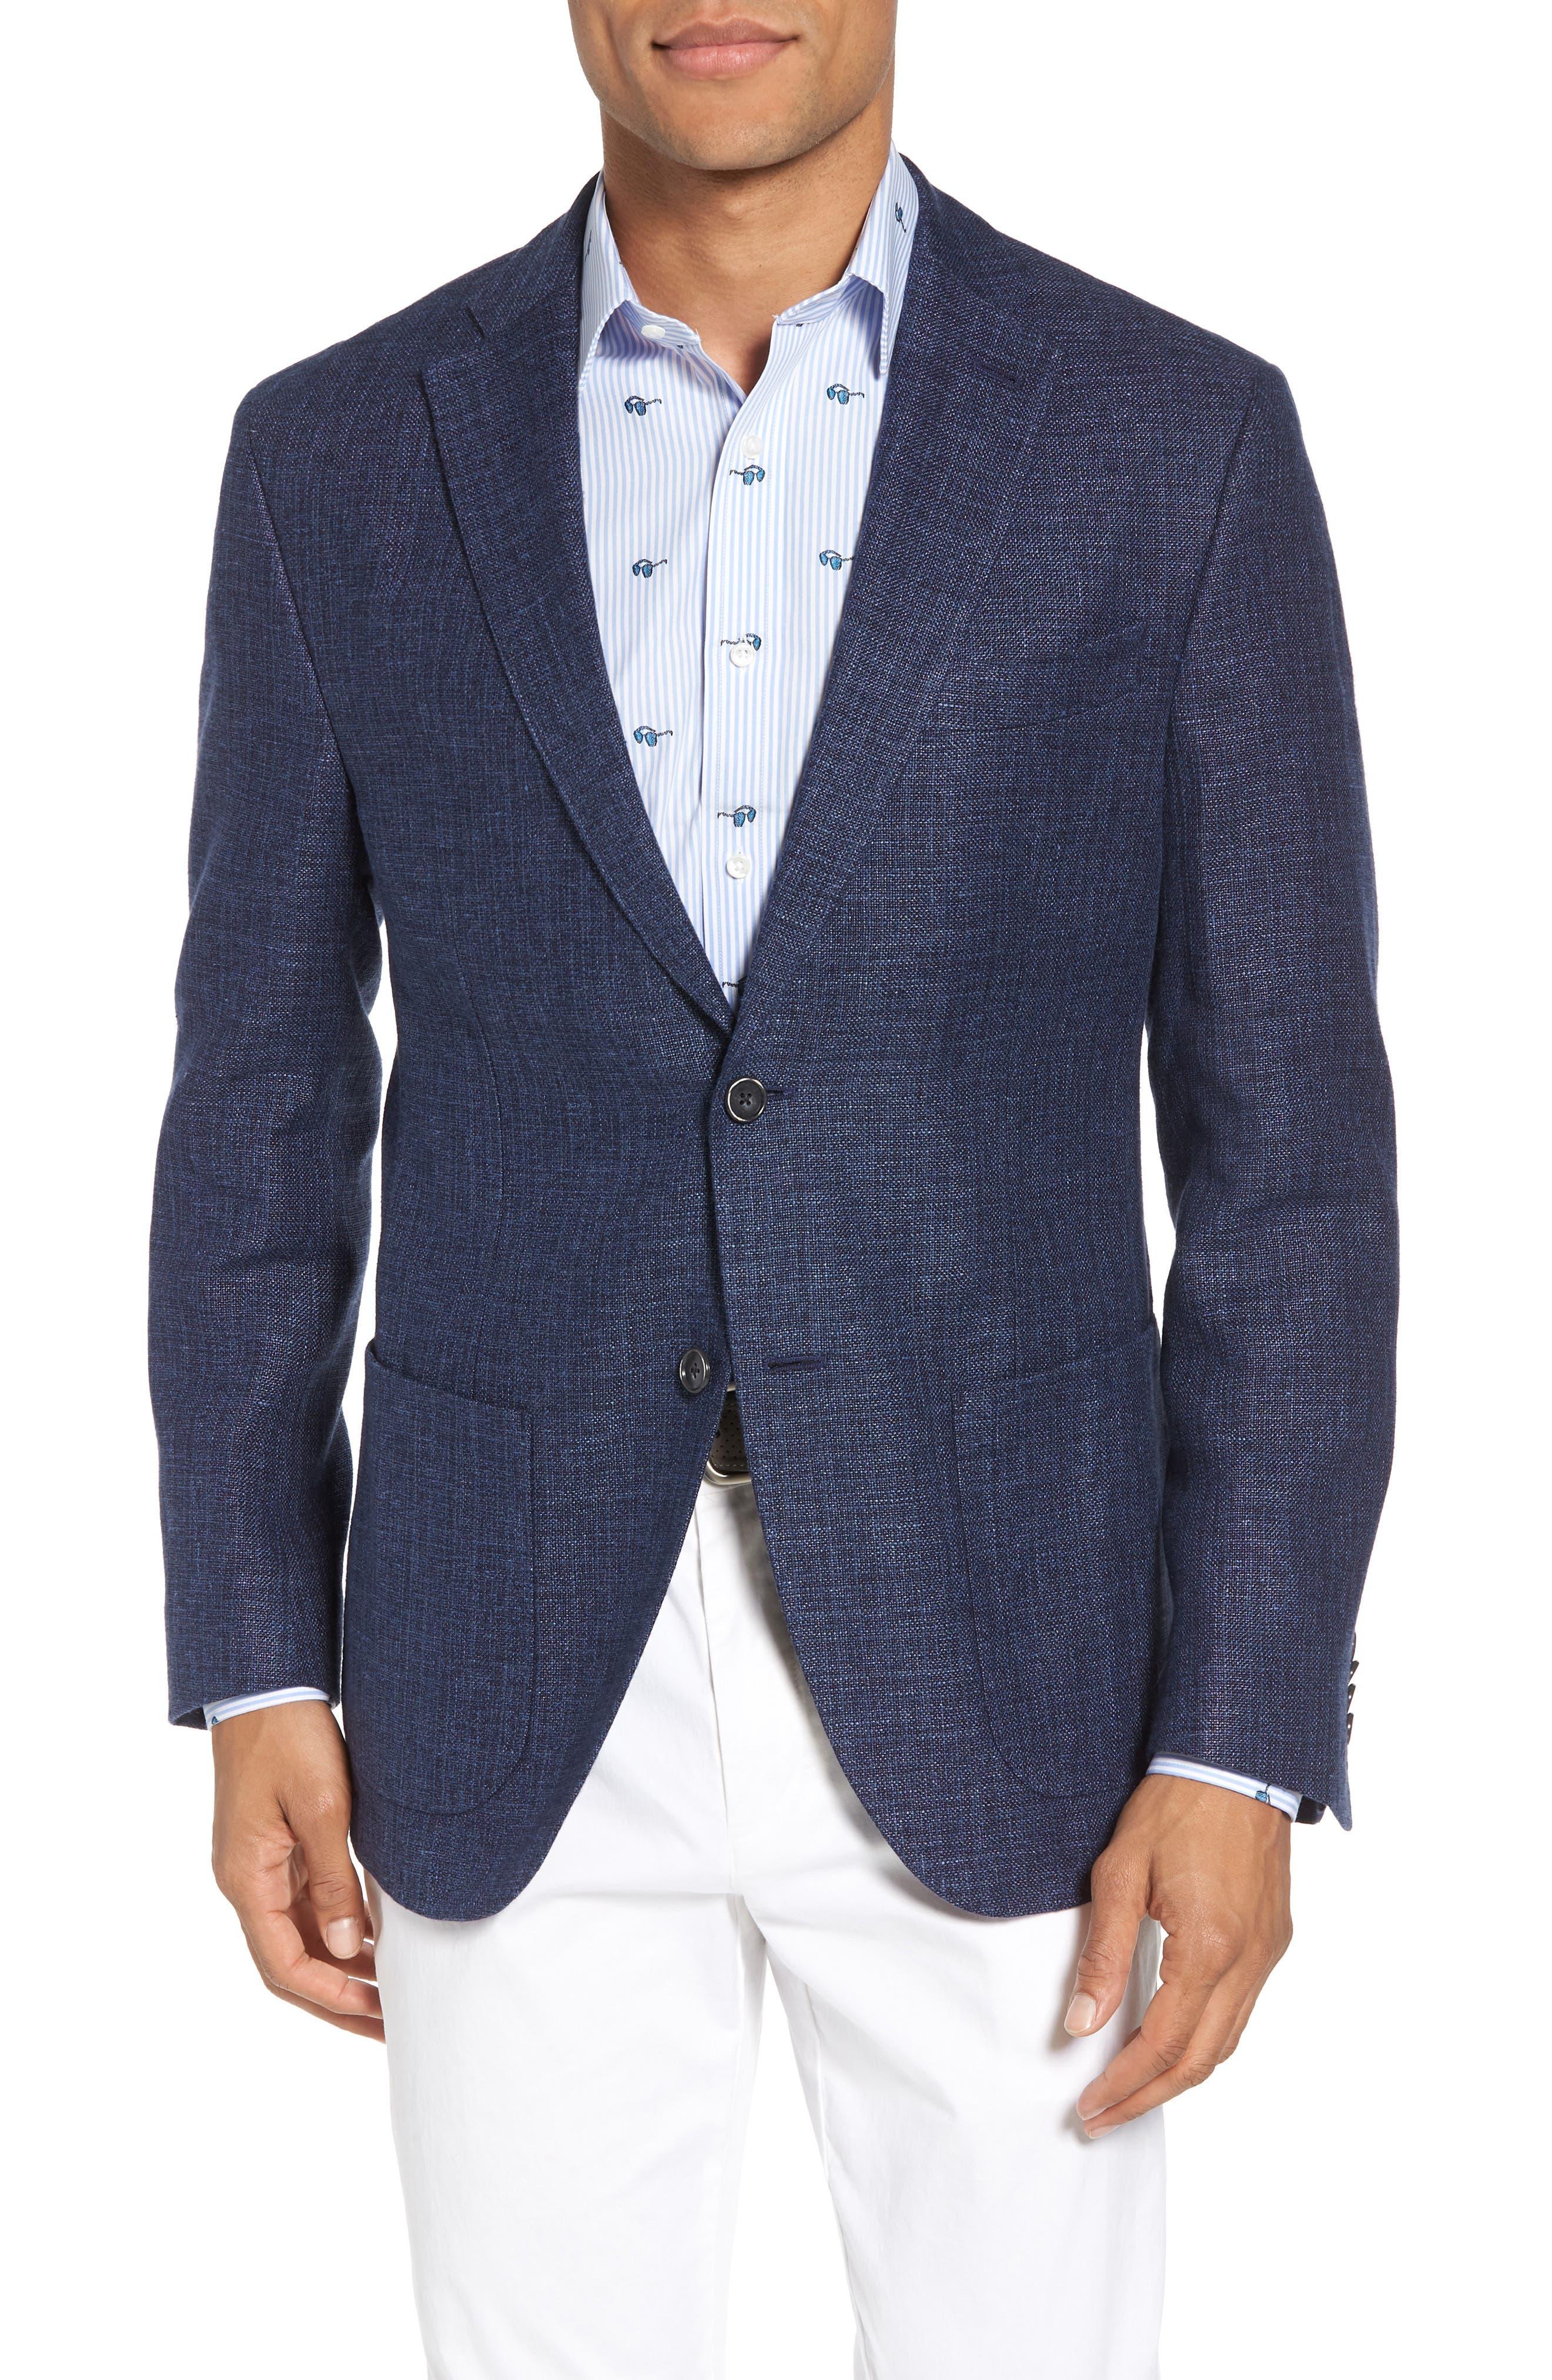 Trent Trim Fit Wool & Linen Blazer,                             Main thumbnail 1, color,                             Navy